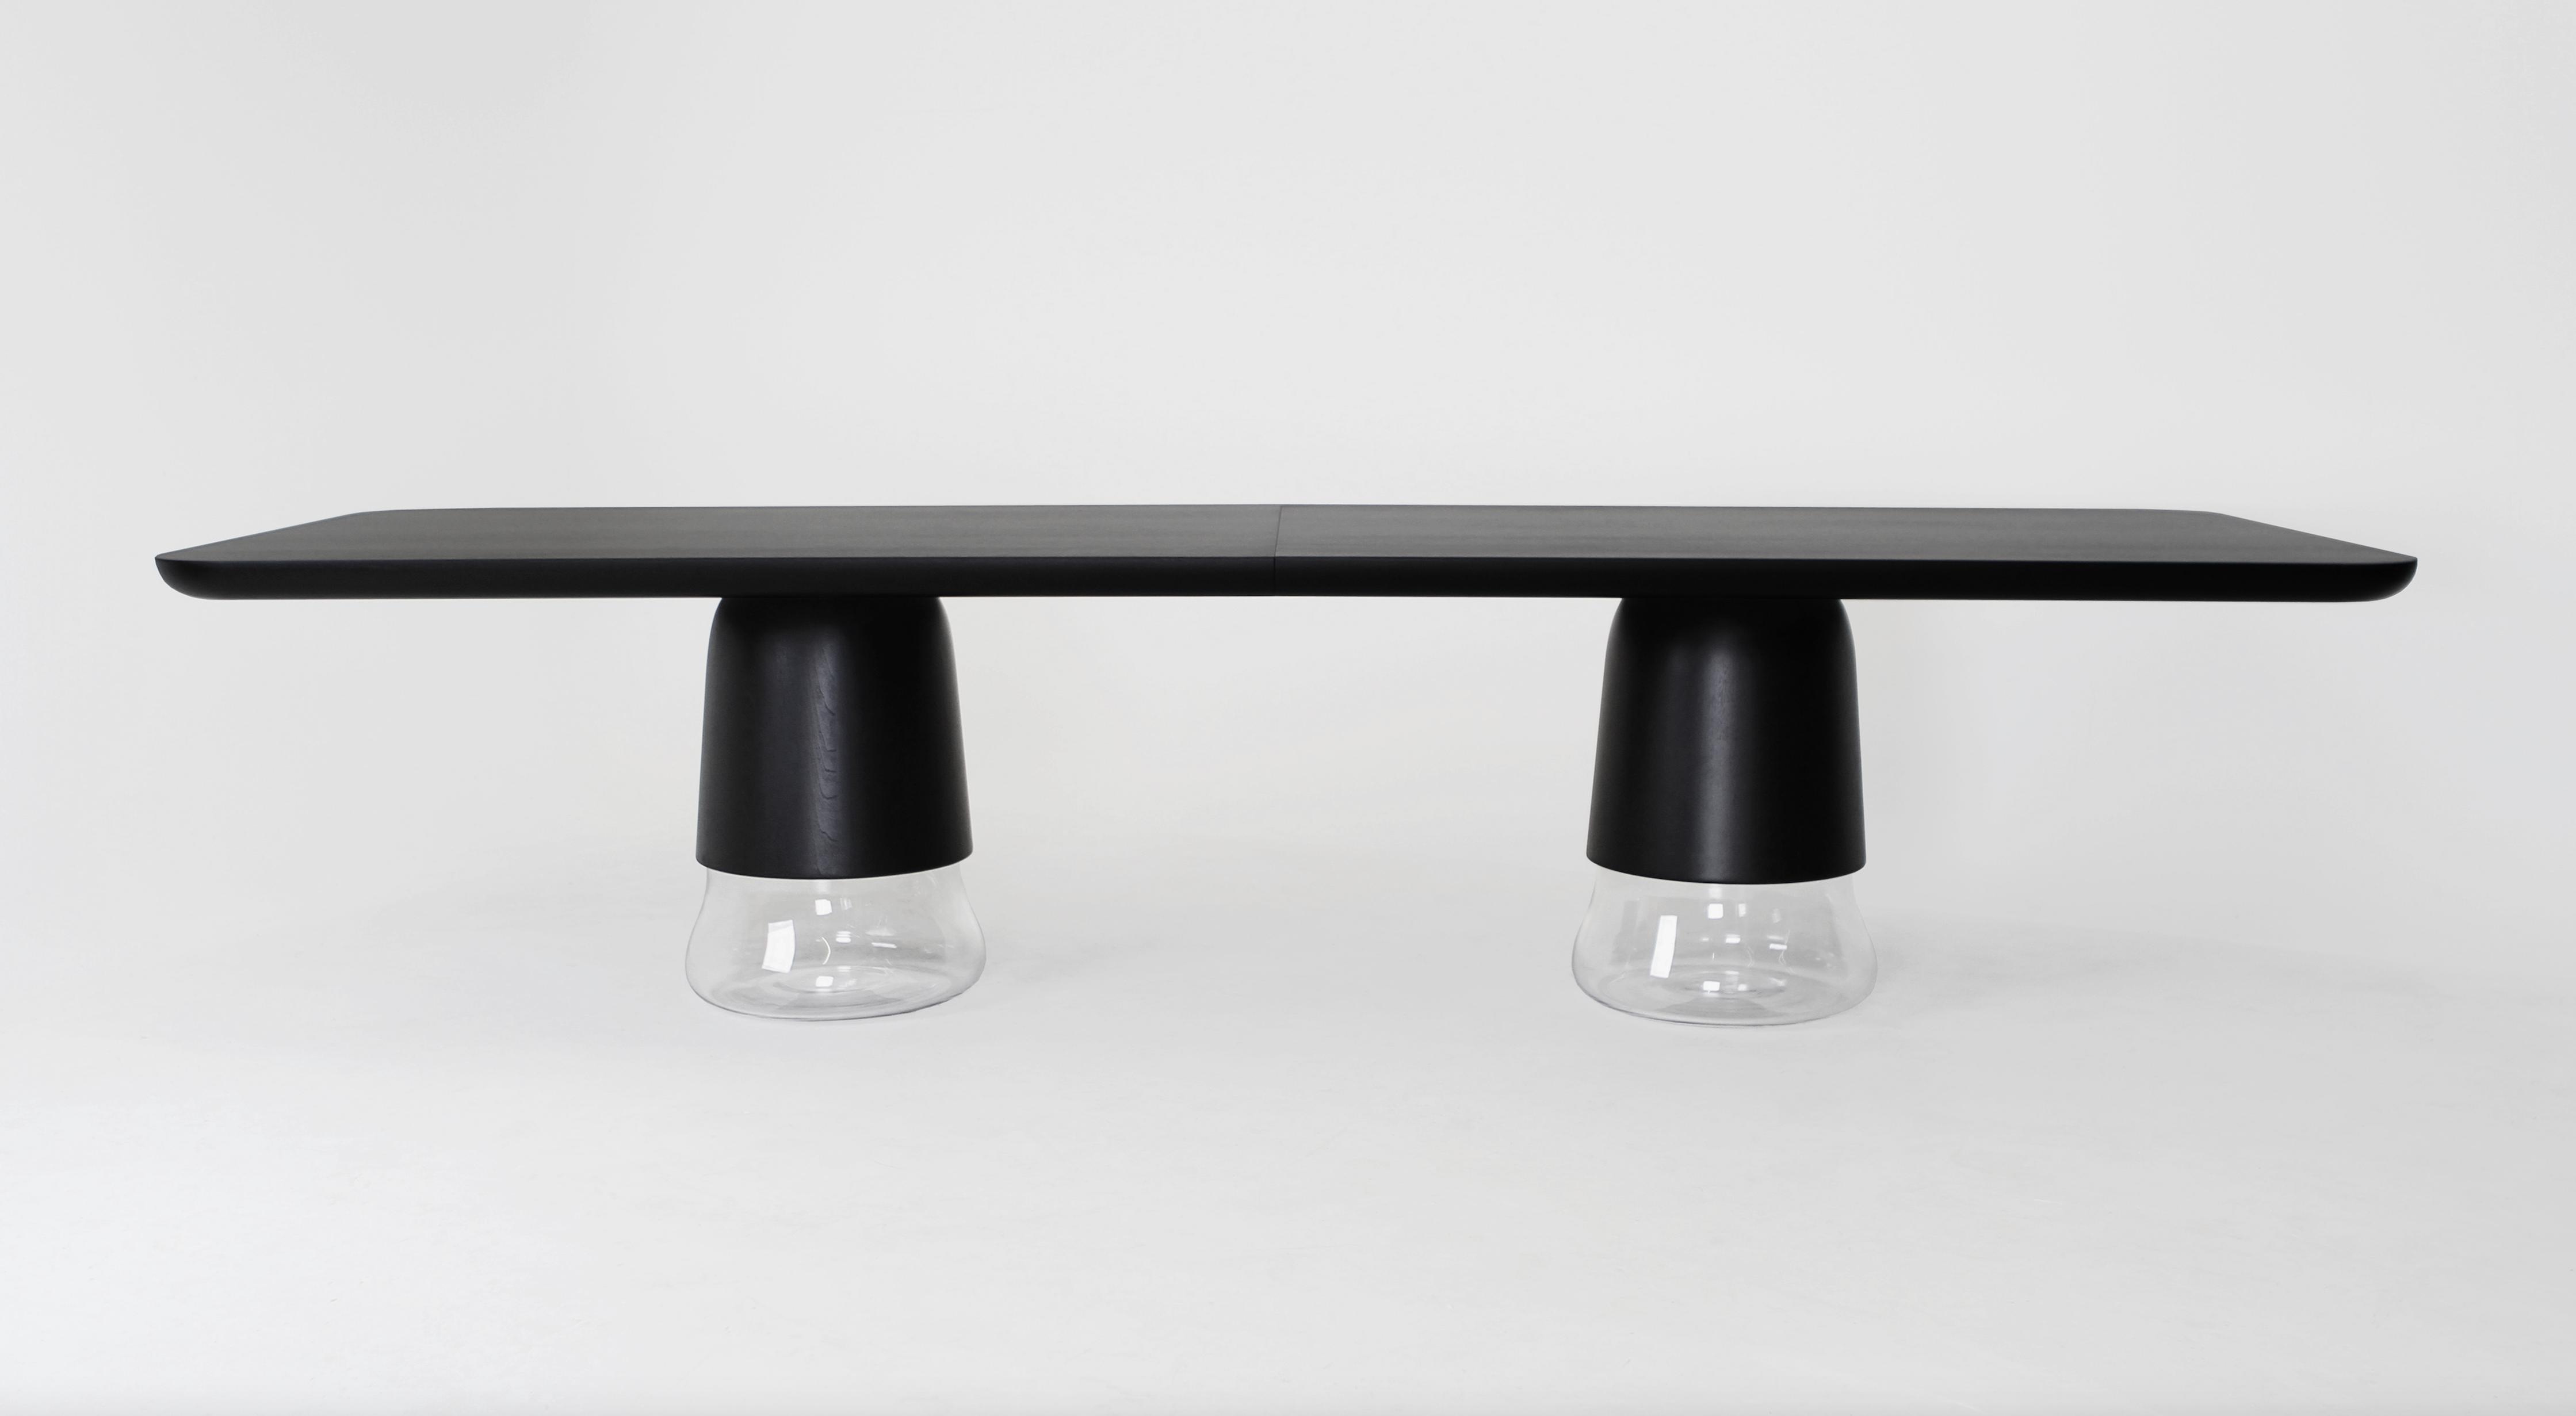 Eric Schmitt Breathtaking Luxury Designs - Floating table eric schmitt Eric Schmitt: Breathtaking Luxury Designs Eric Schmitt Breathtaking Luxury Designs Floating table